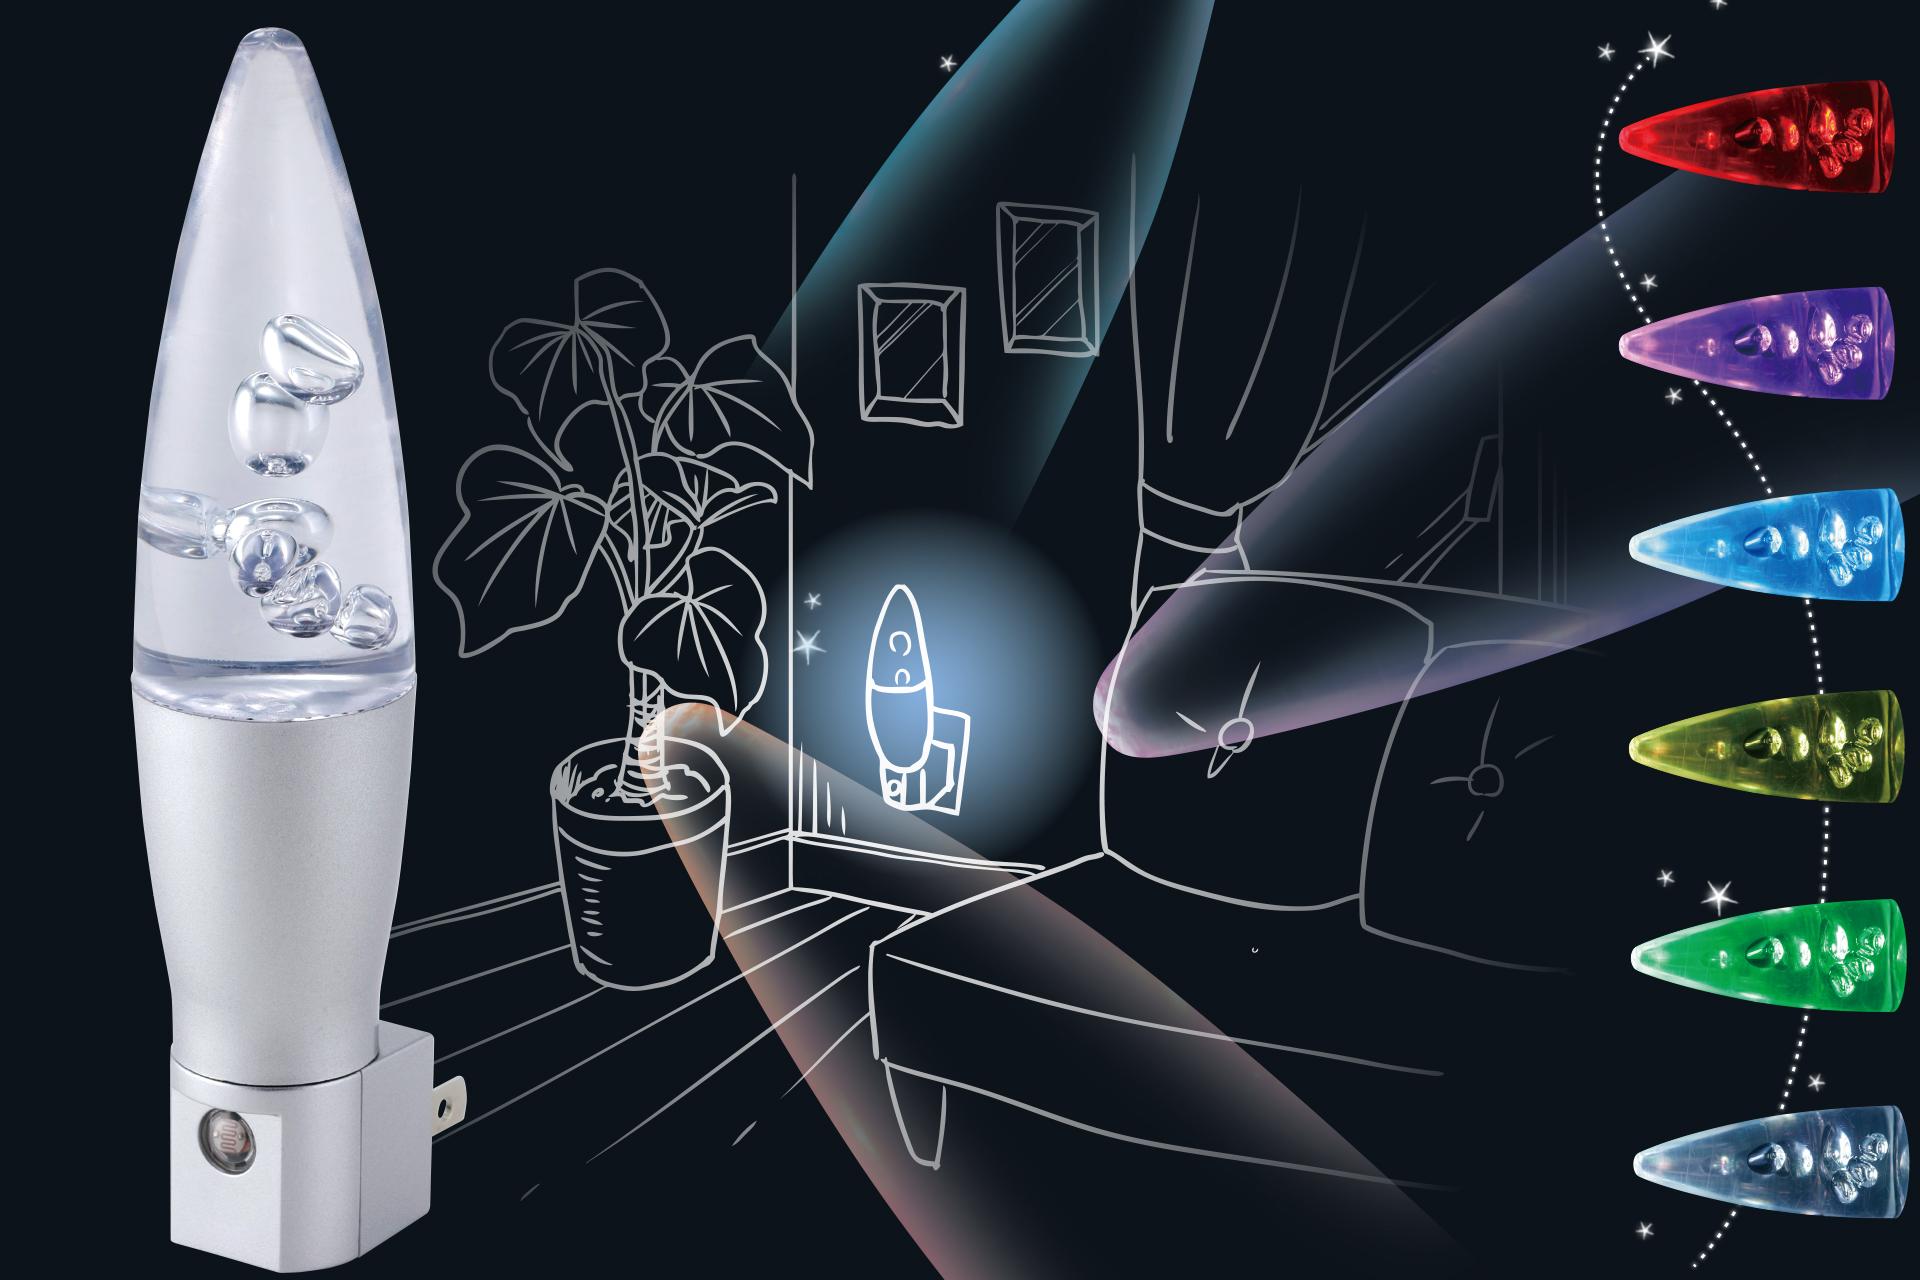 LED ナイトランプ イルミネーション